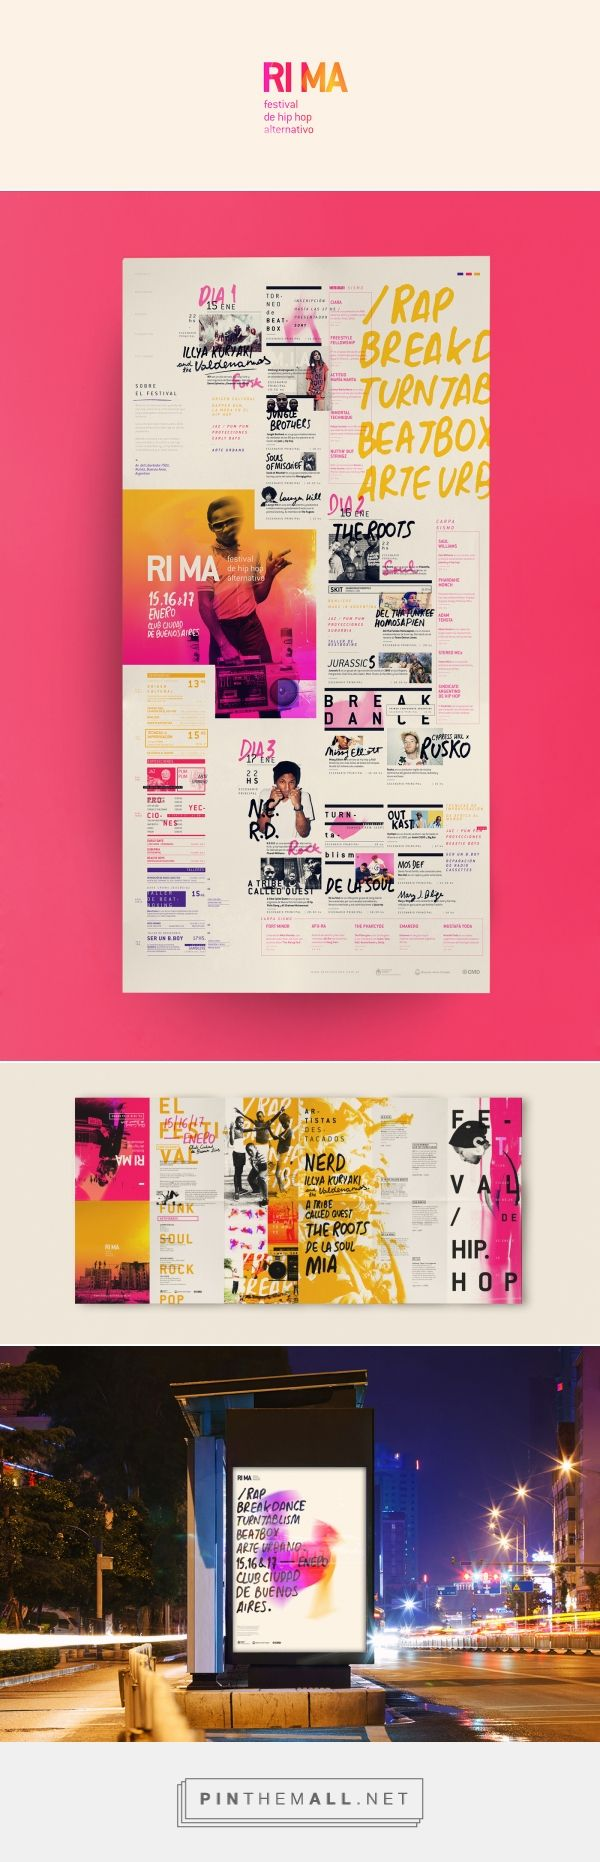 RIMA  Festival de hip hop alternativo on Behance   Fivestar Branding – Design and Branding Agency & Inspiration Gallery